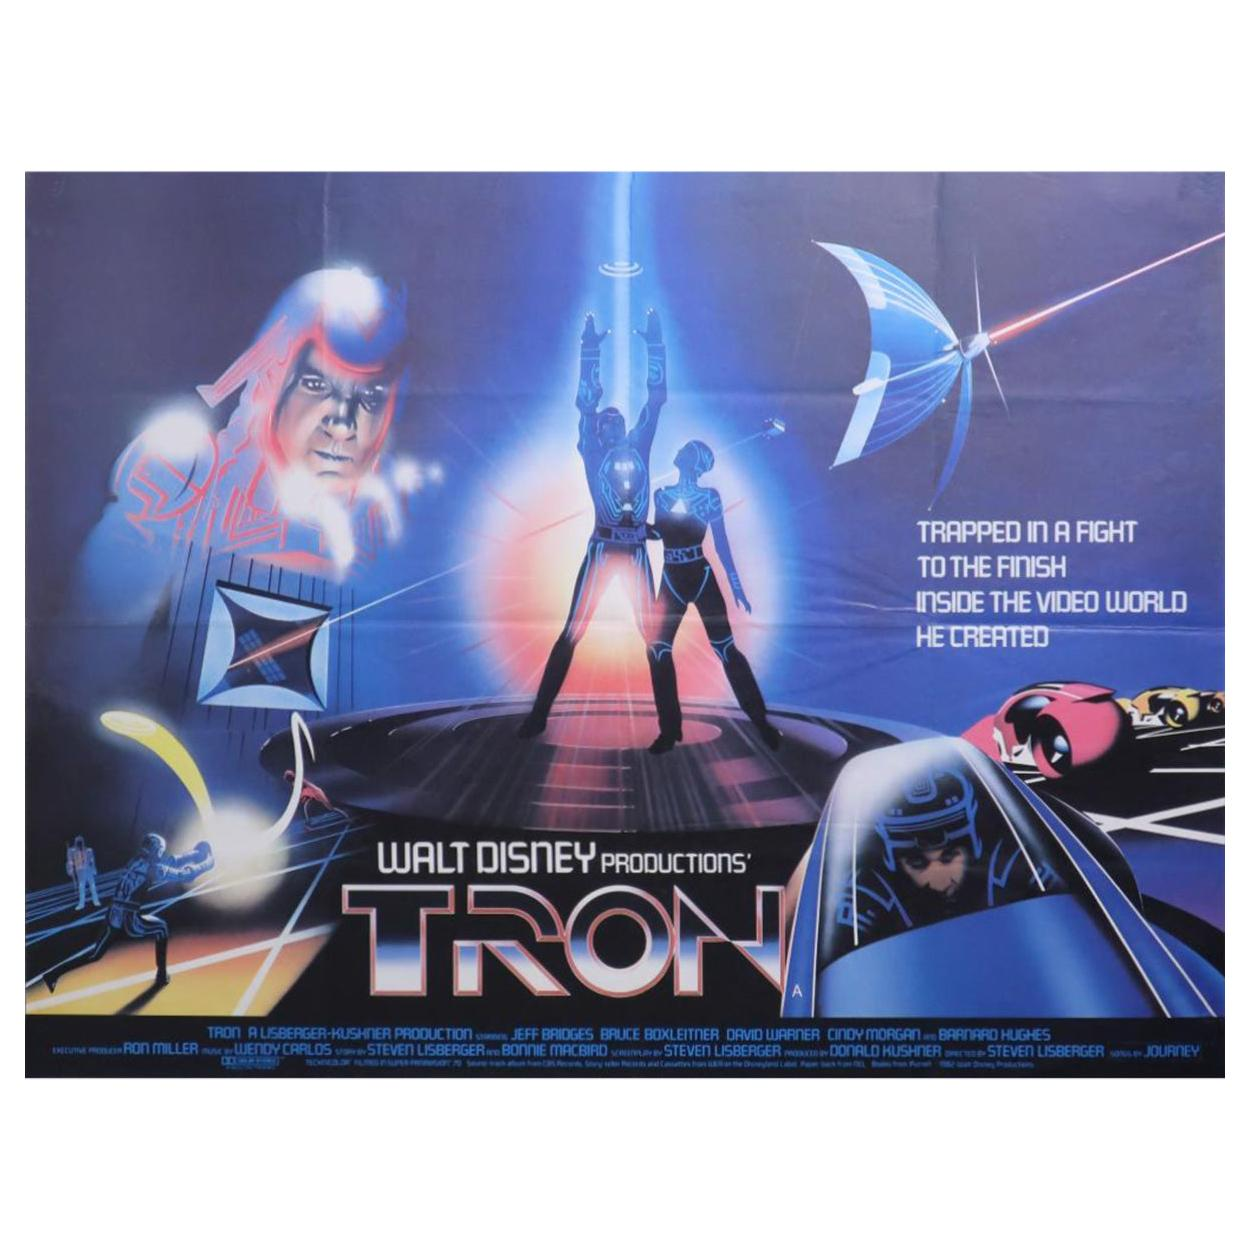 Tron '1982' Poster